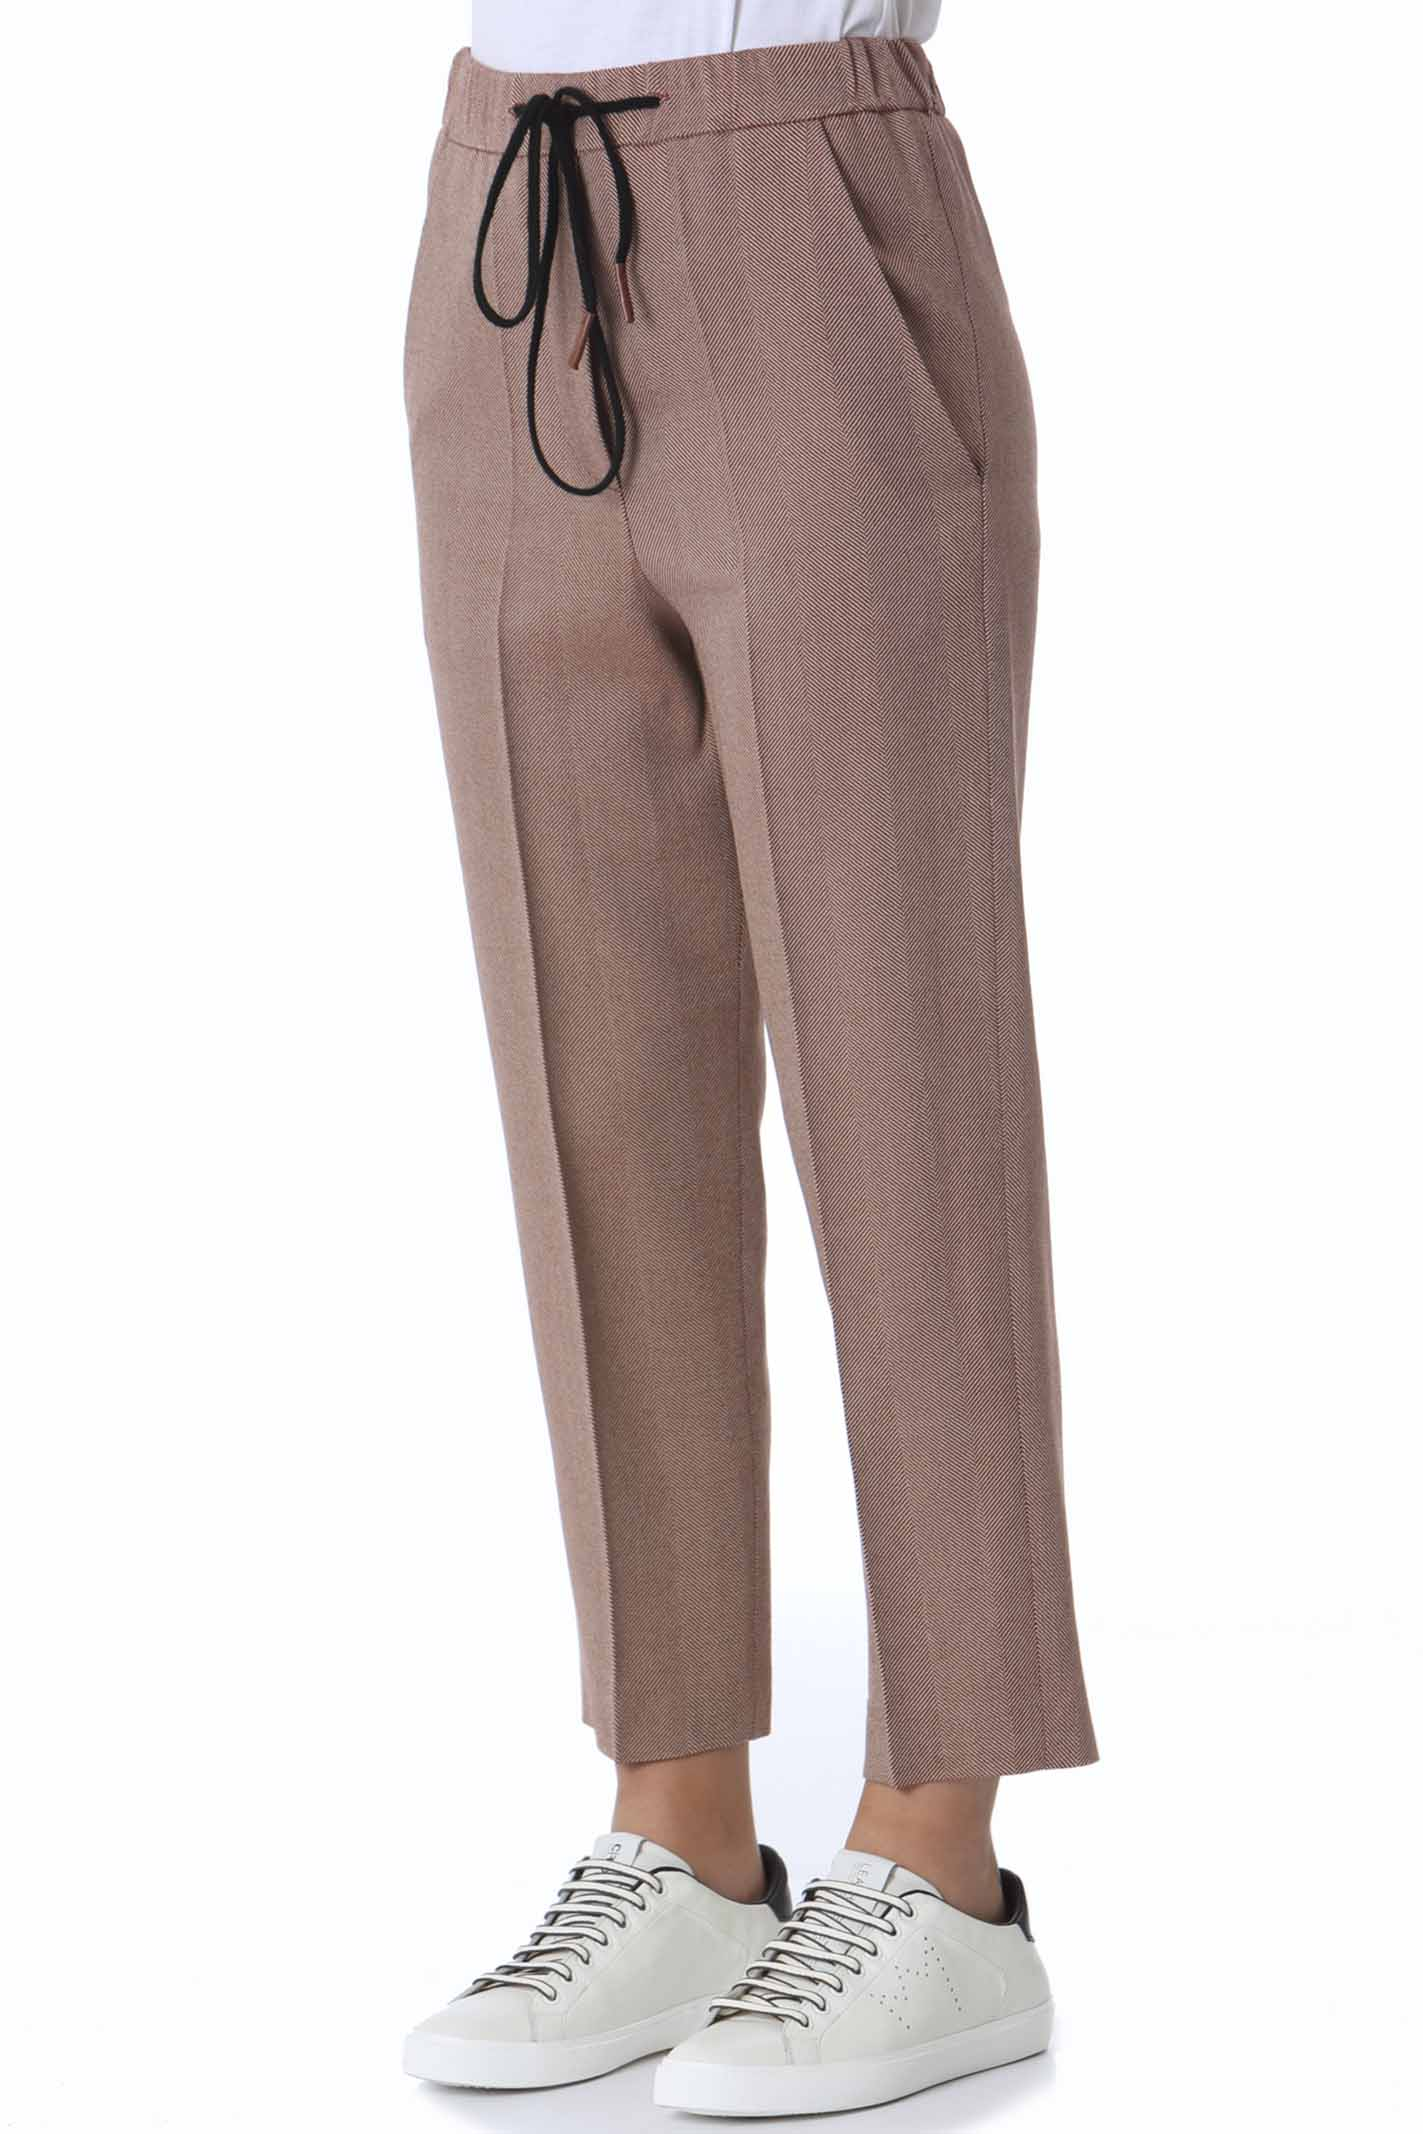 Pantalone donna a sigaretta resca shetland ALYSI   Pantaloni   151119-A1057COTTO